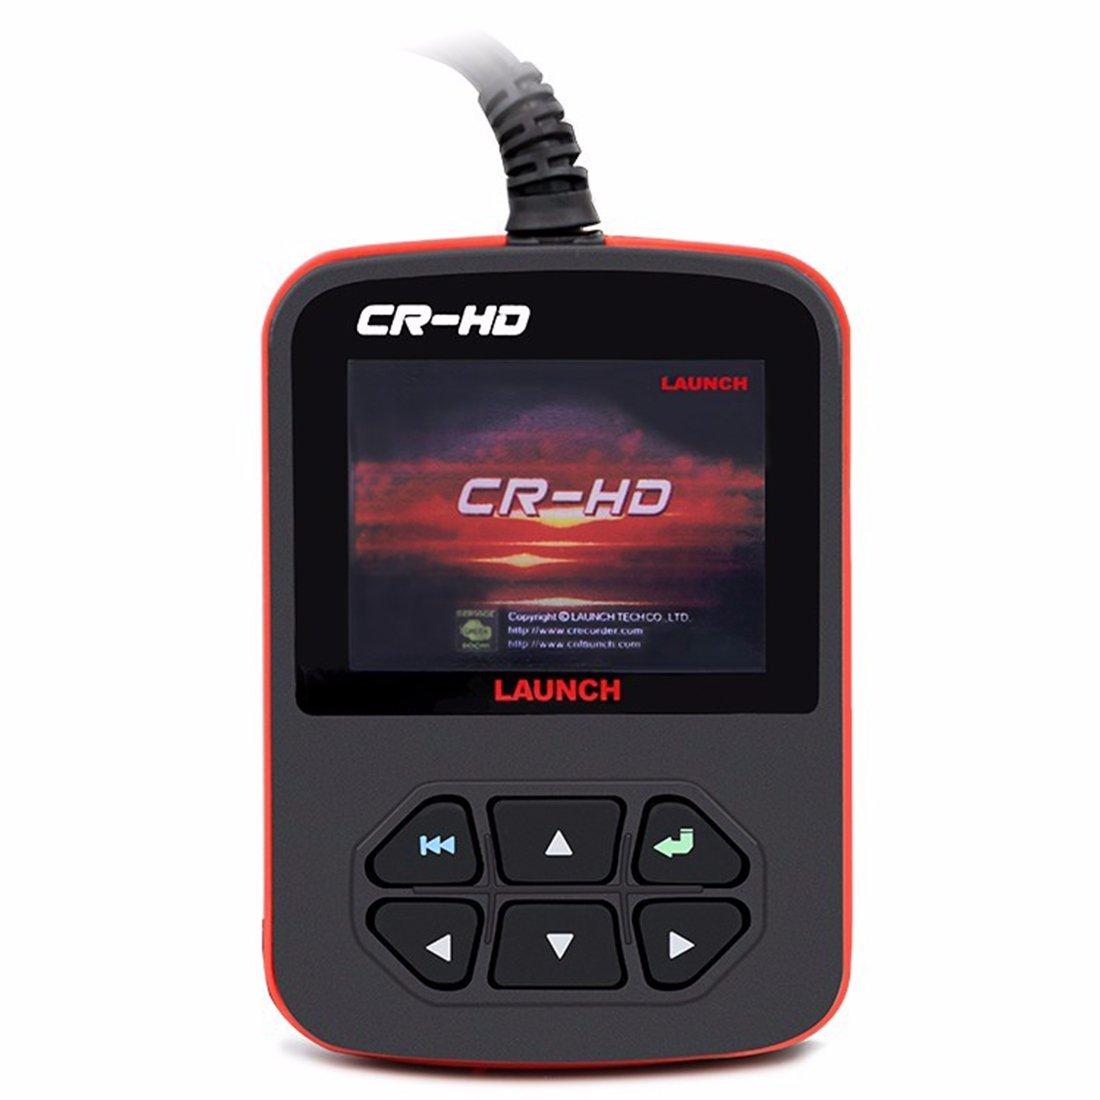 Launch x431 CReader CR-HD Heavy Duty Code Scanner Launch CR HD Truck Code Scanner